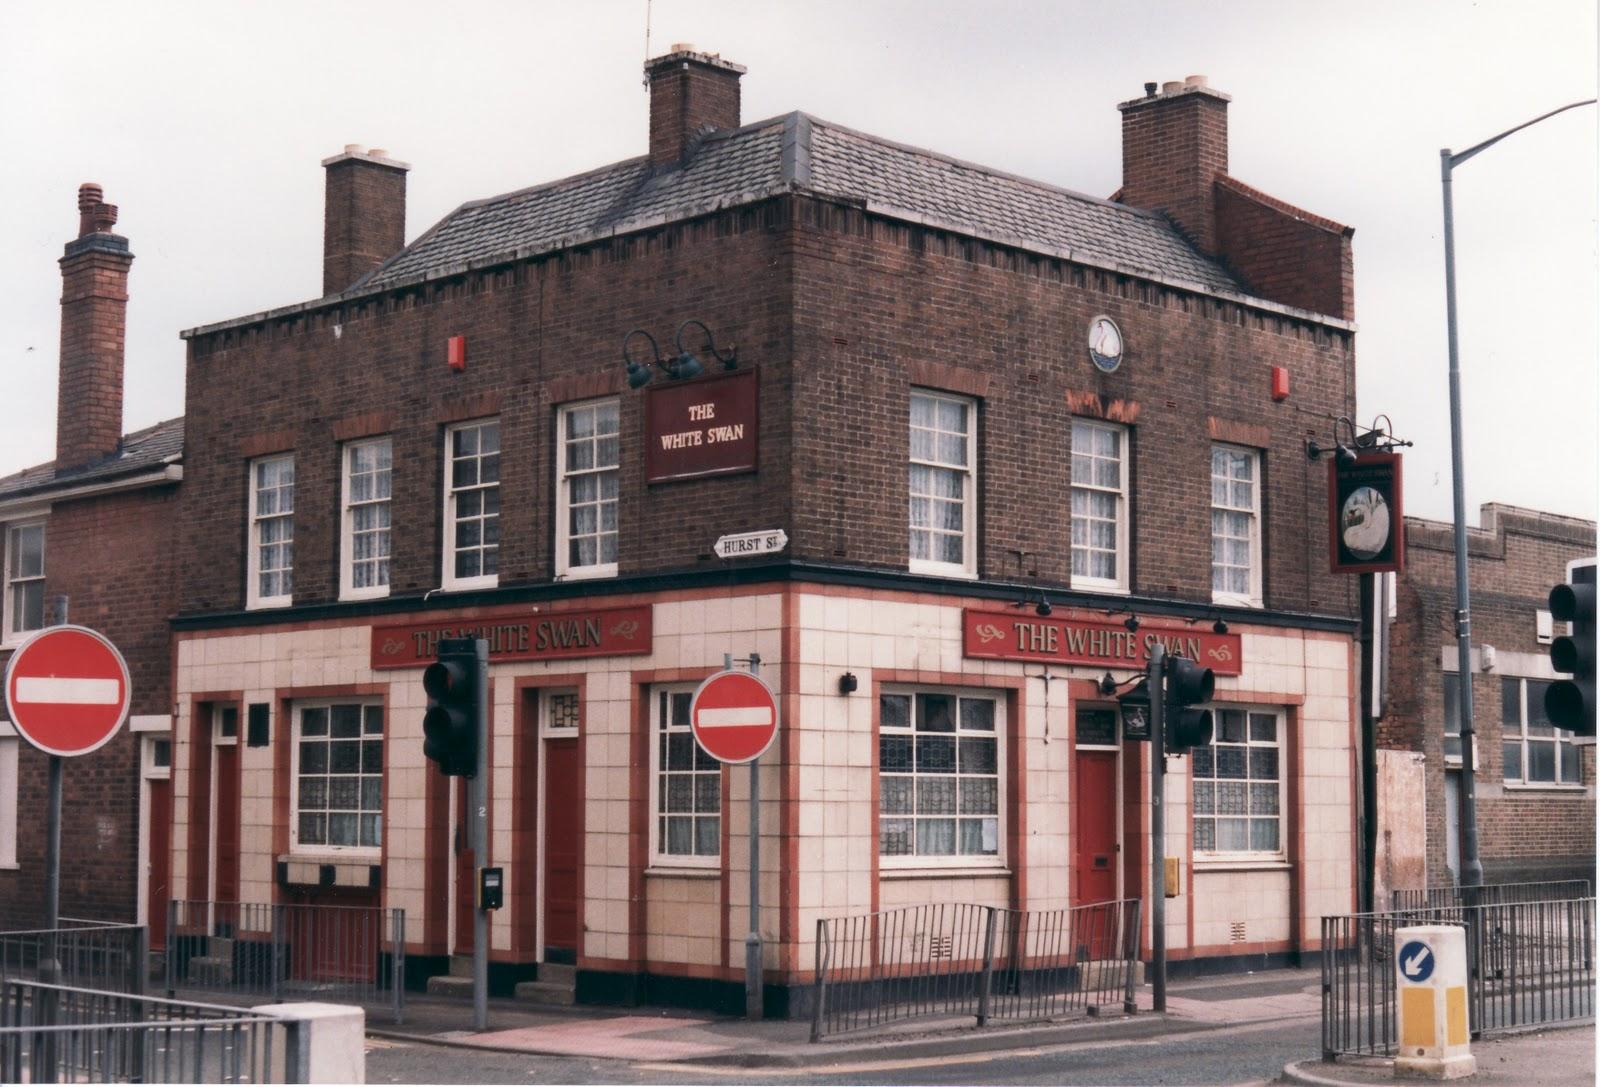 The white swan gay pub